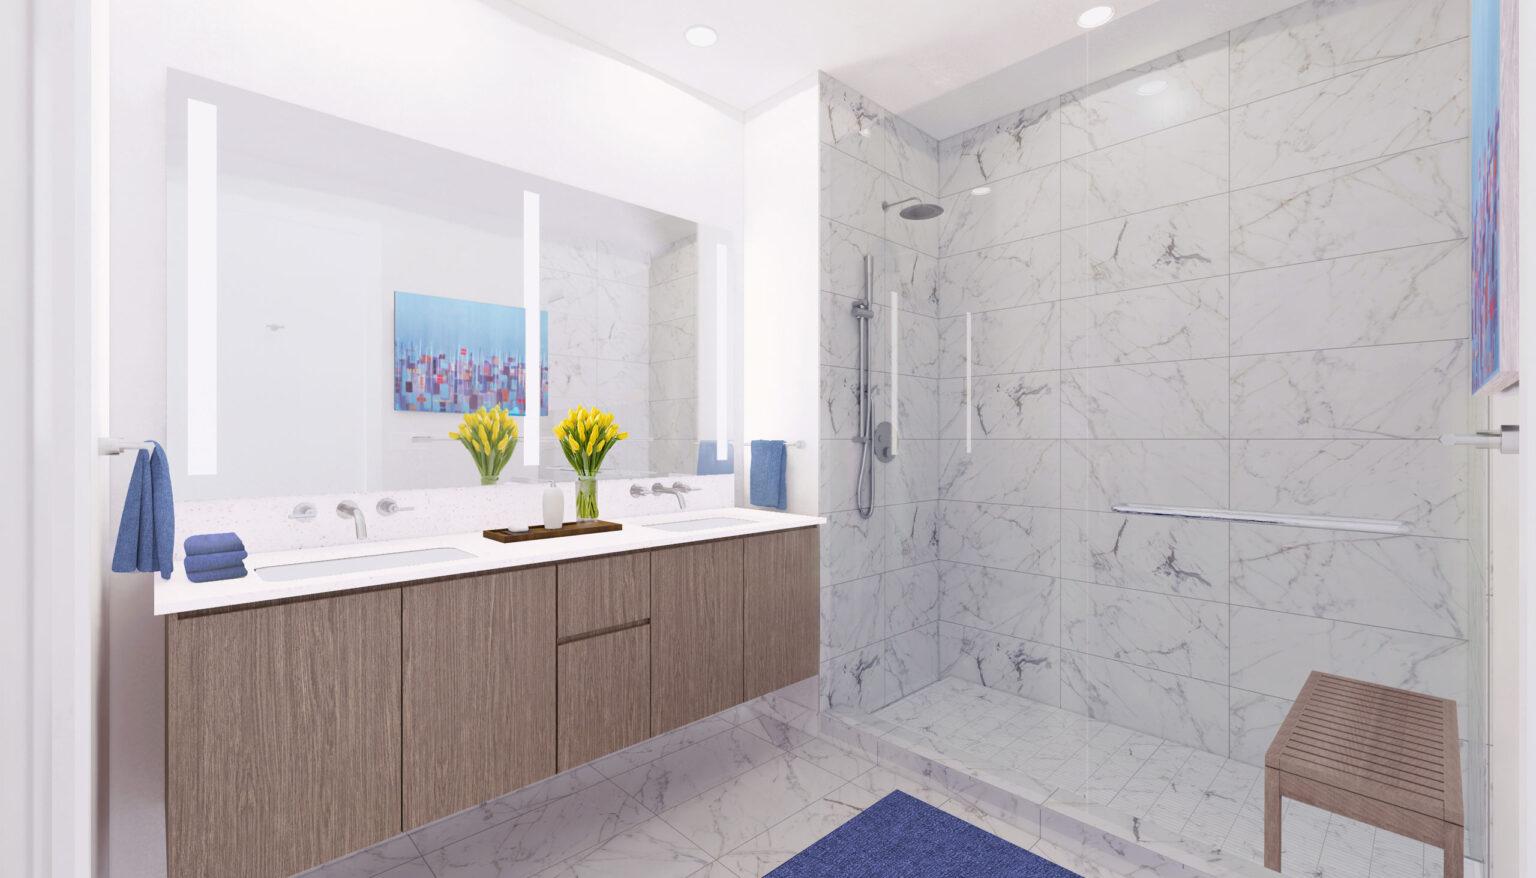 Penthouse B bathroom palette, Scandinavian White